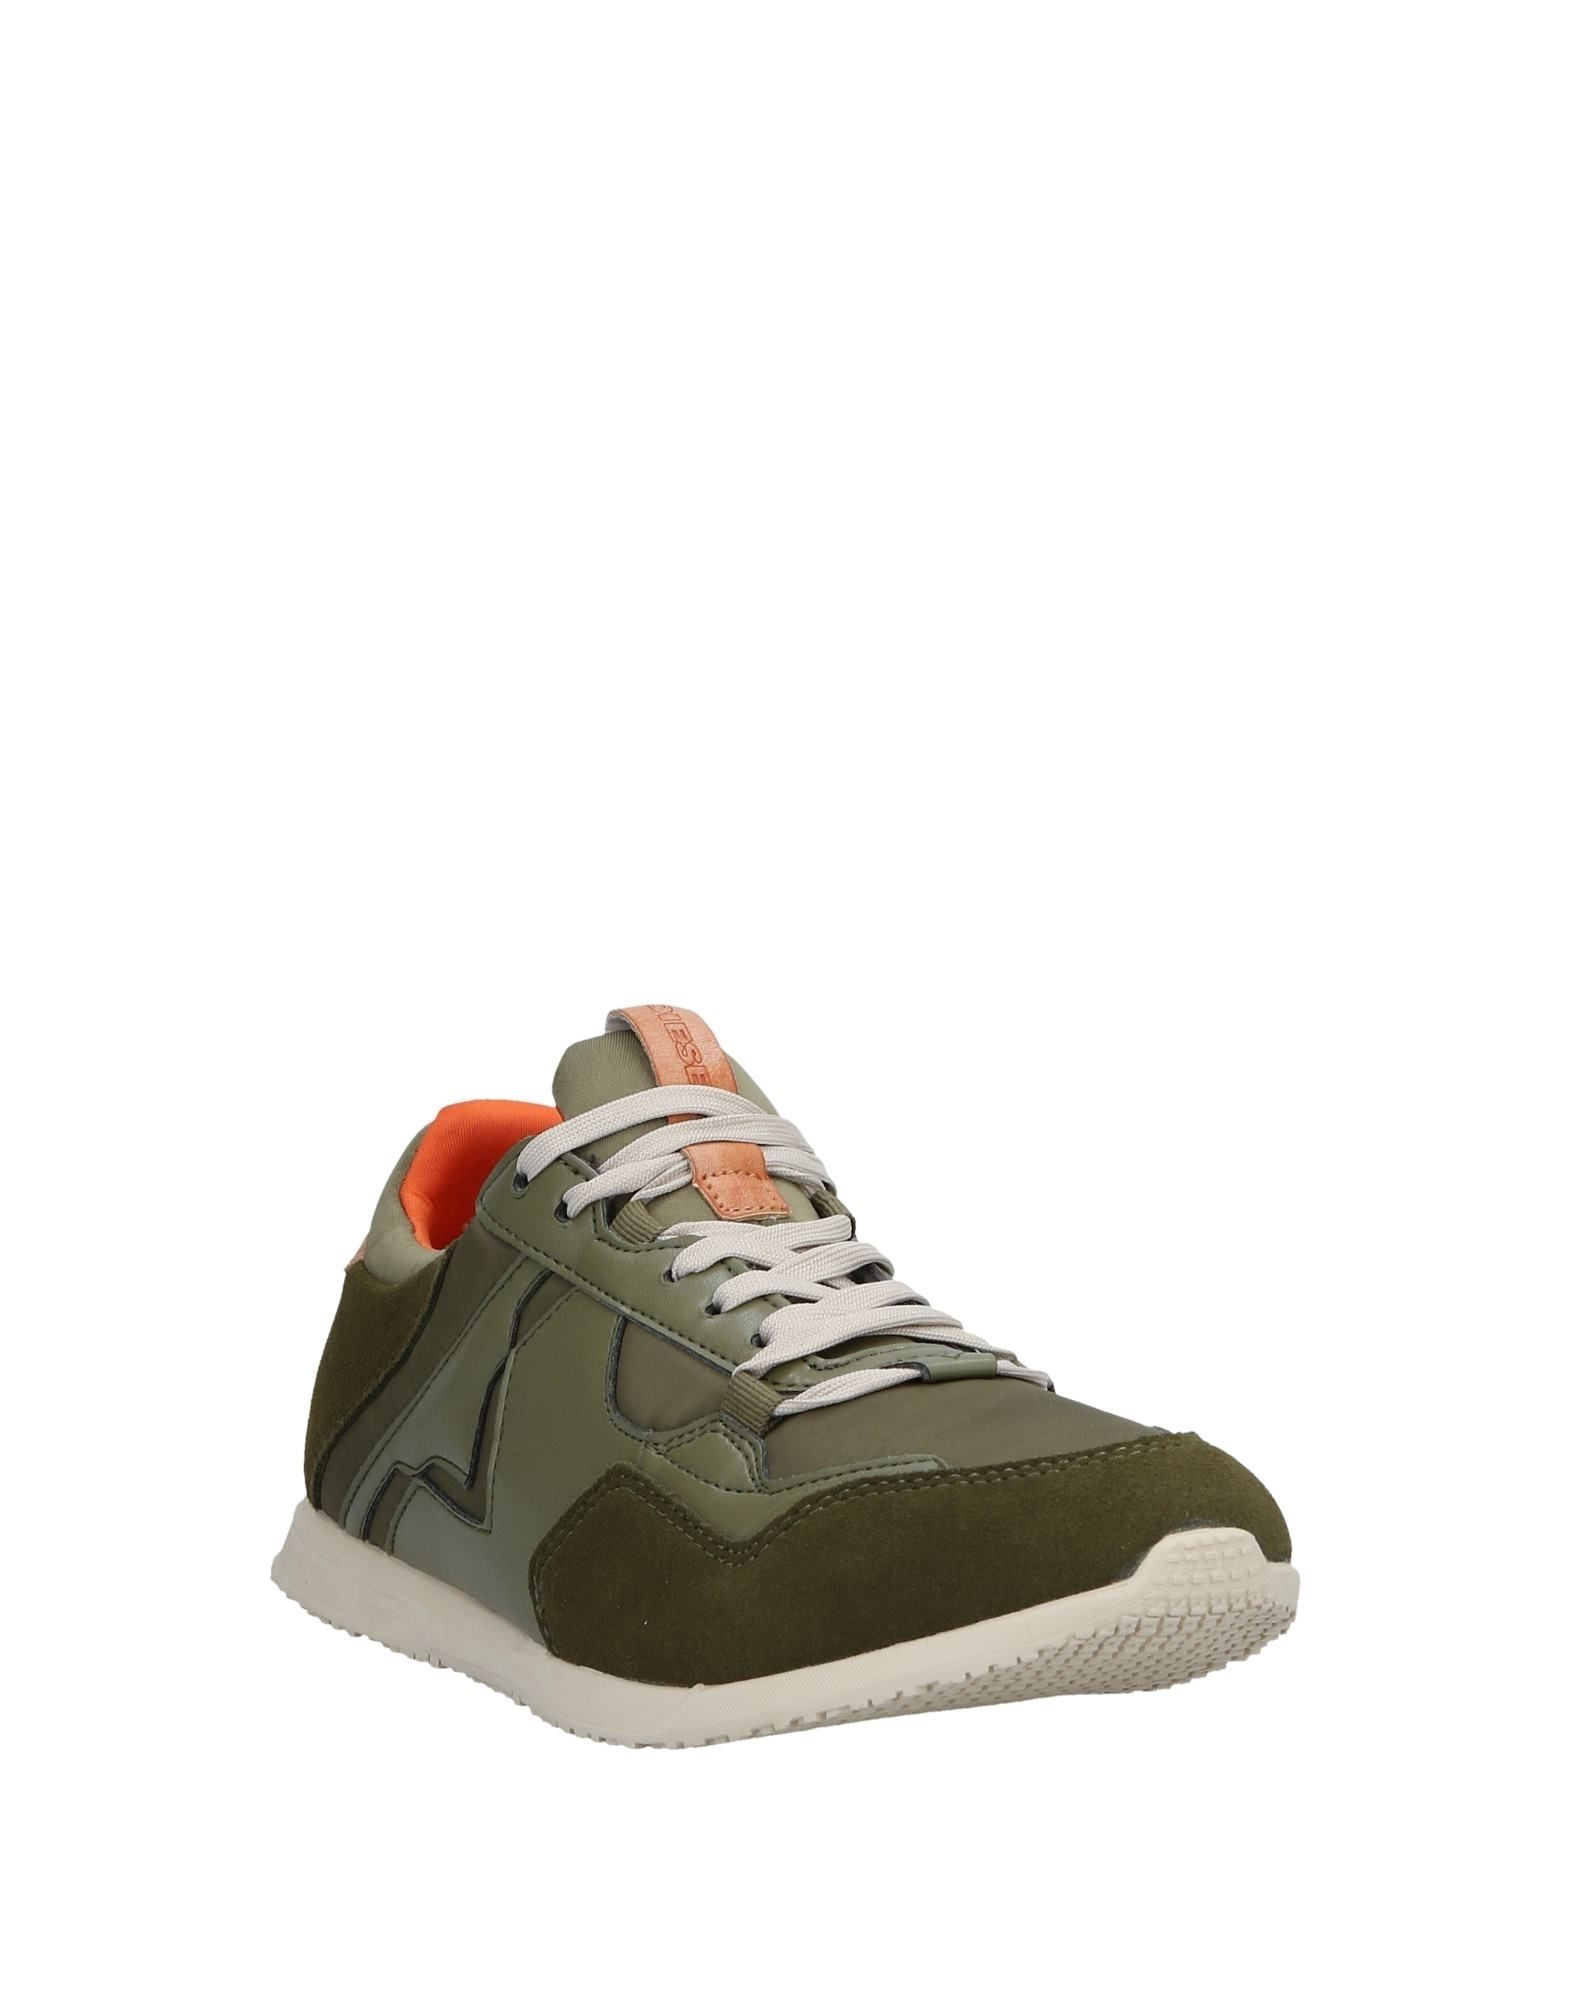 Diesel Sneakers 11534408XC Herren  11534408XC Sneakers Heiße Schuhe 19b6e6